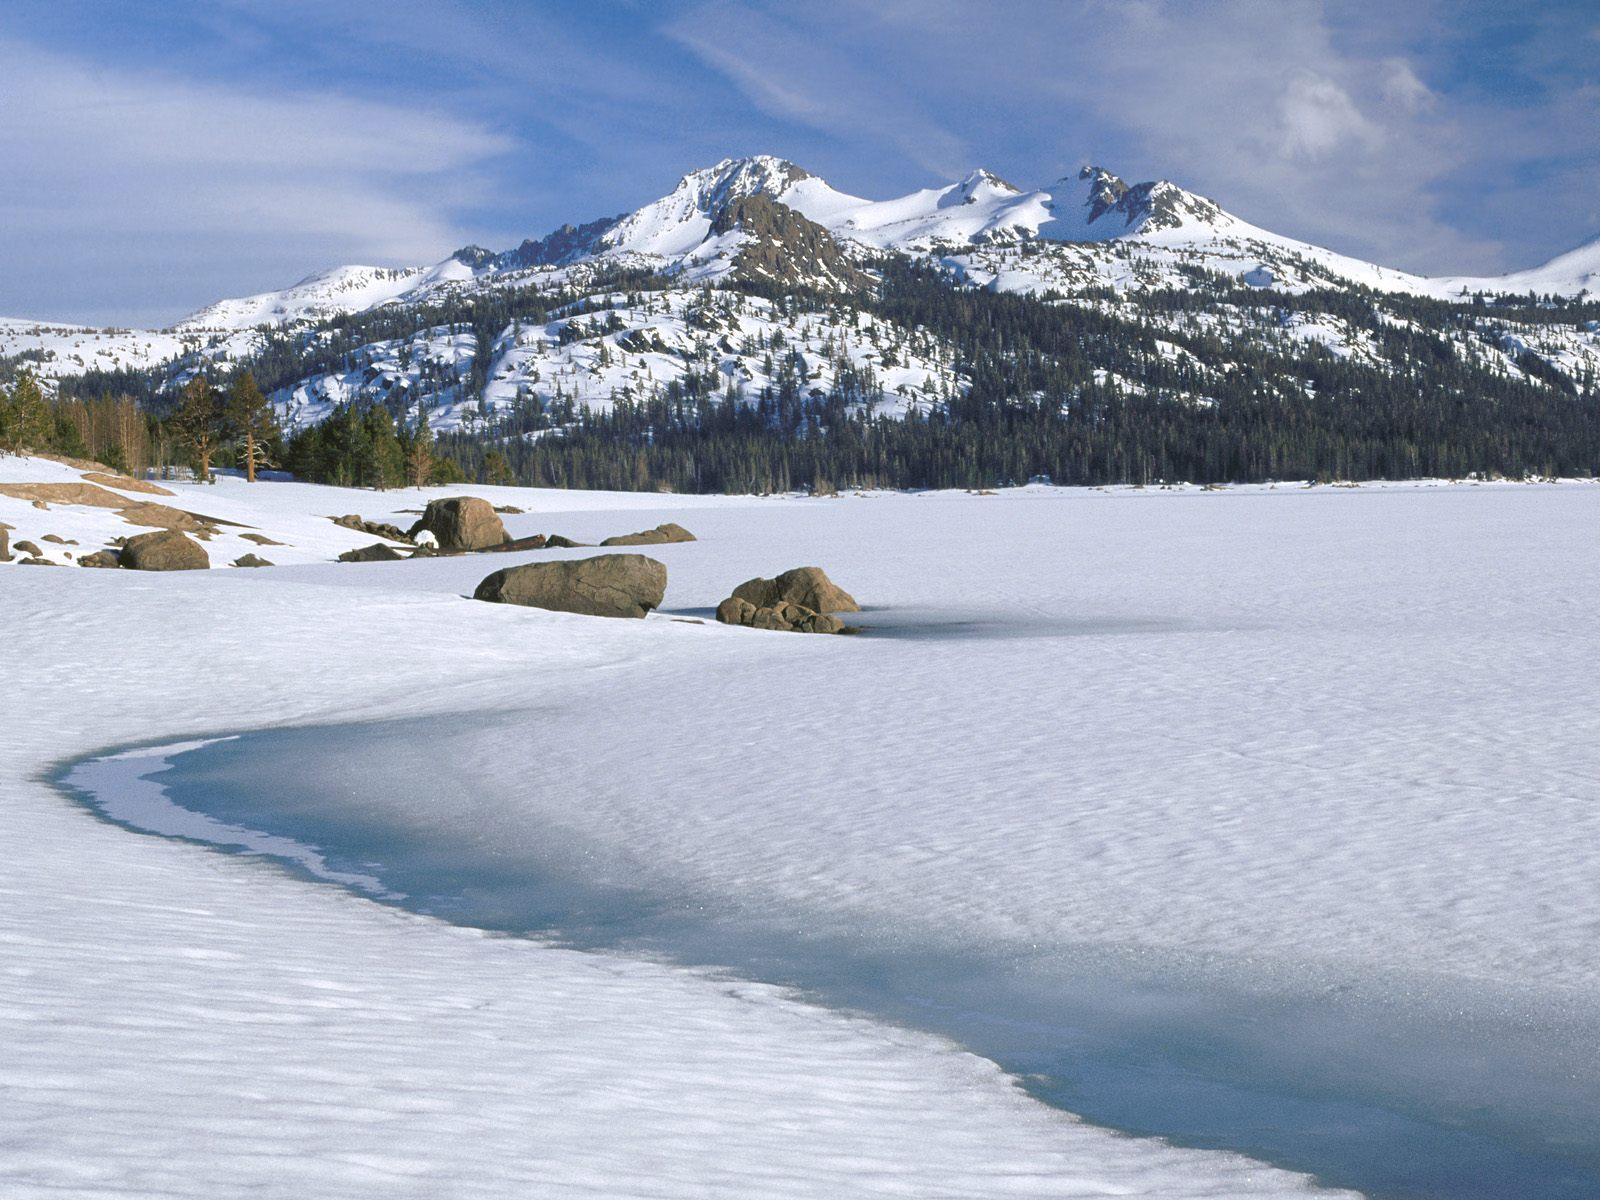 http://2.bp.blogspot.com/_4zaBvBMGWxg/TQUiAp0ds4I/AAAAAAAAACE/HOh1aai8wp0/s1600/Caples+Lake%252C+Sierra+Nevada%252C+Calif.jpg